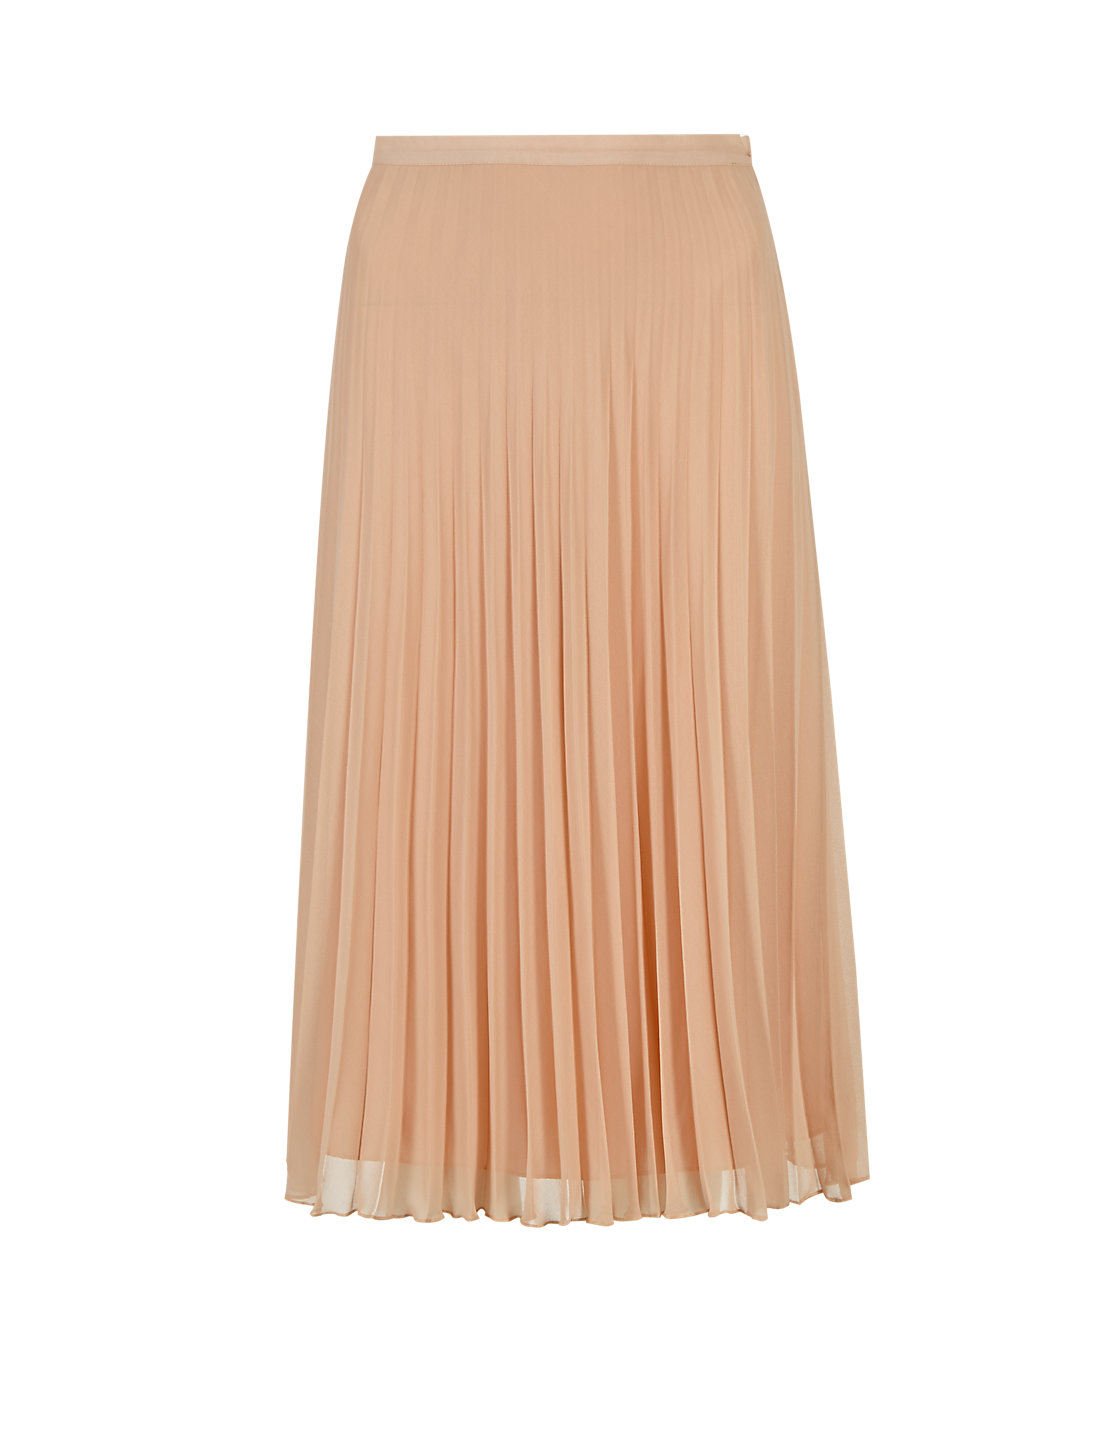 Pleated Knee Length A-Line Skirt | M&S